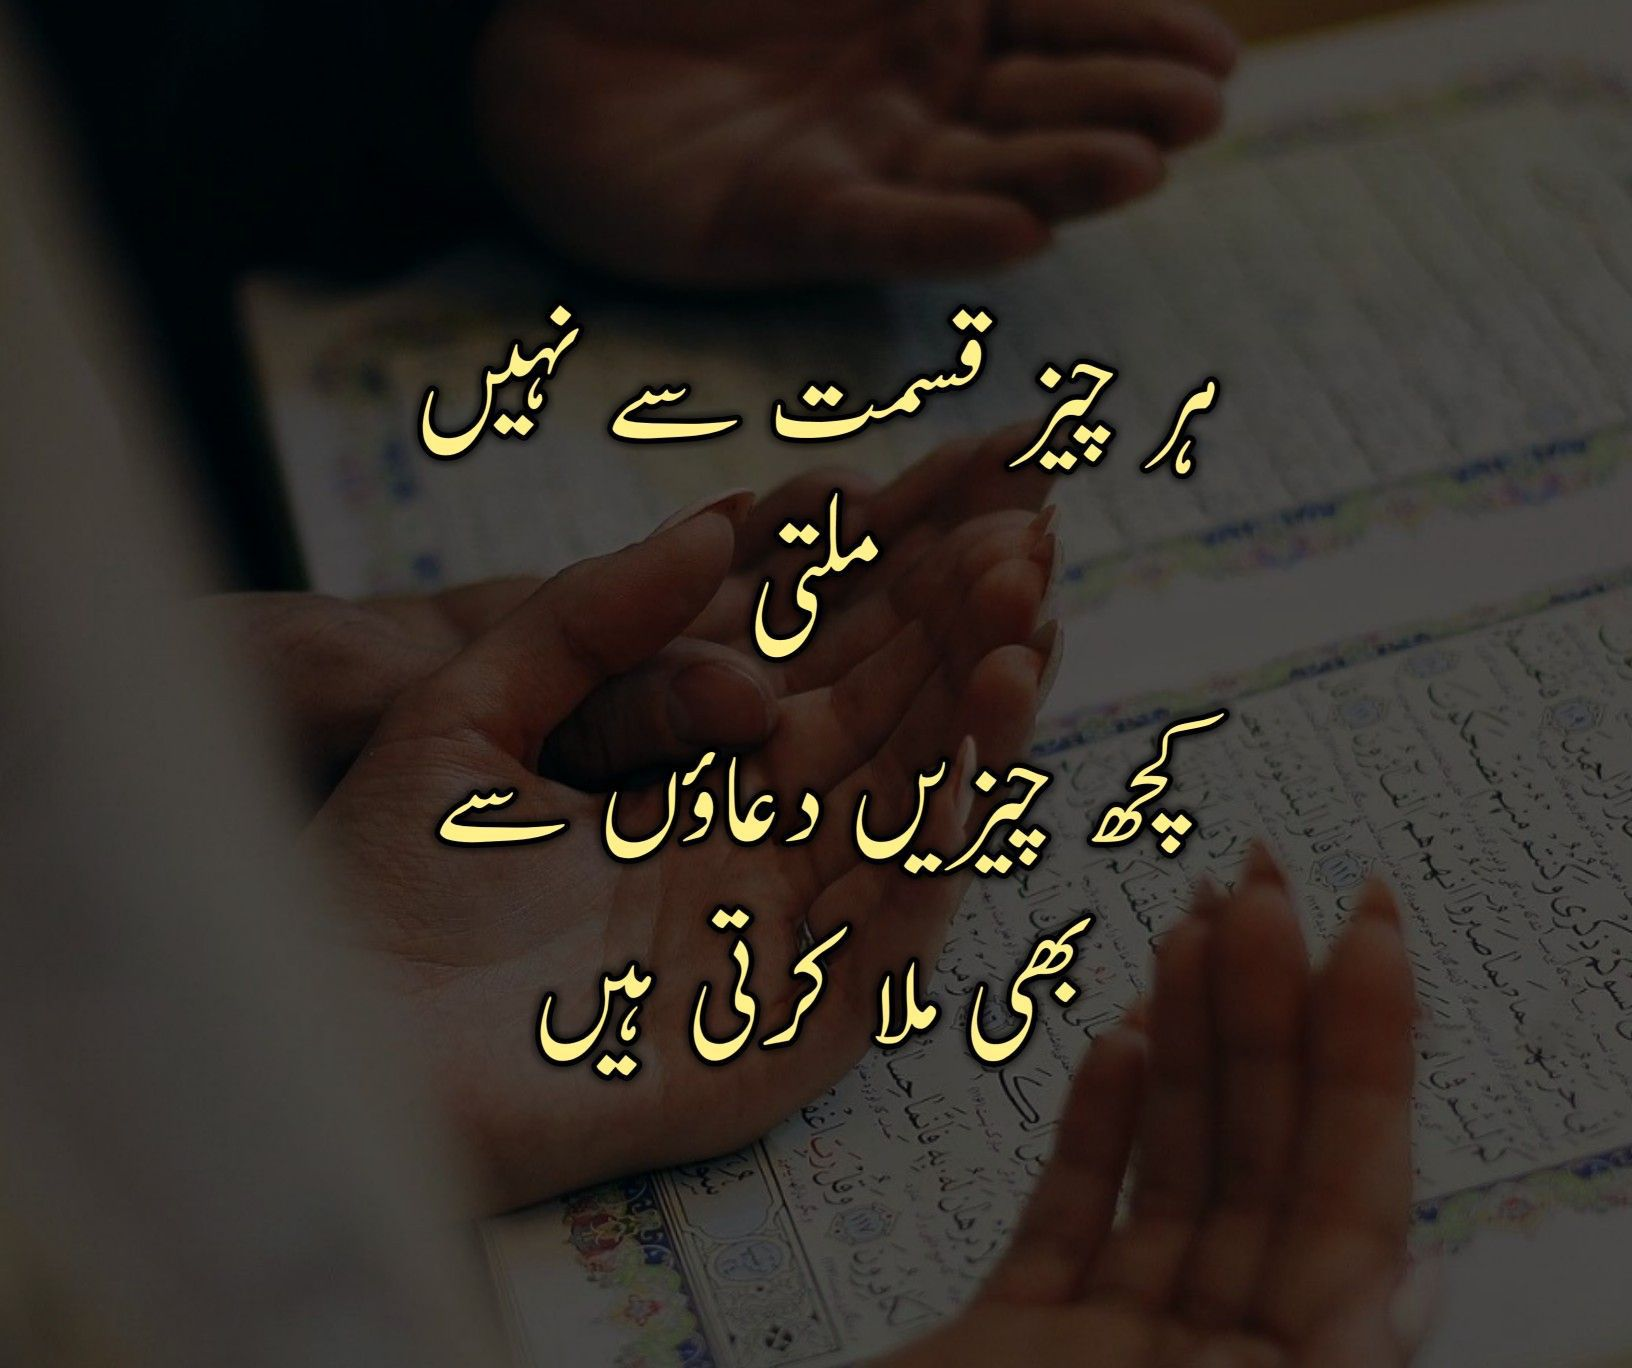 Islamic Quotes Muslim Islam Allah Islamic Quotes Islamic Quotes Quran Funny Inspirational Quotes